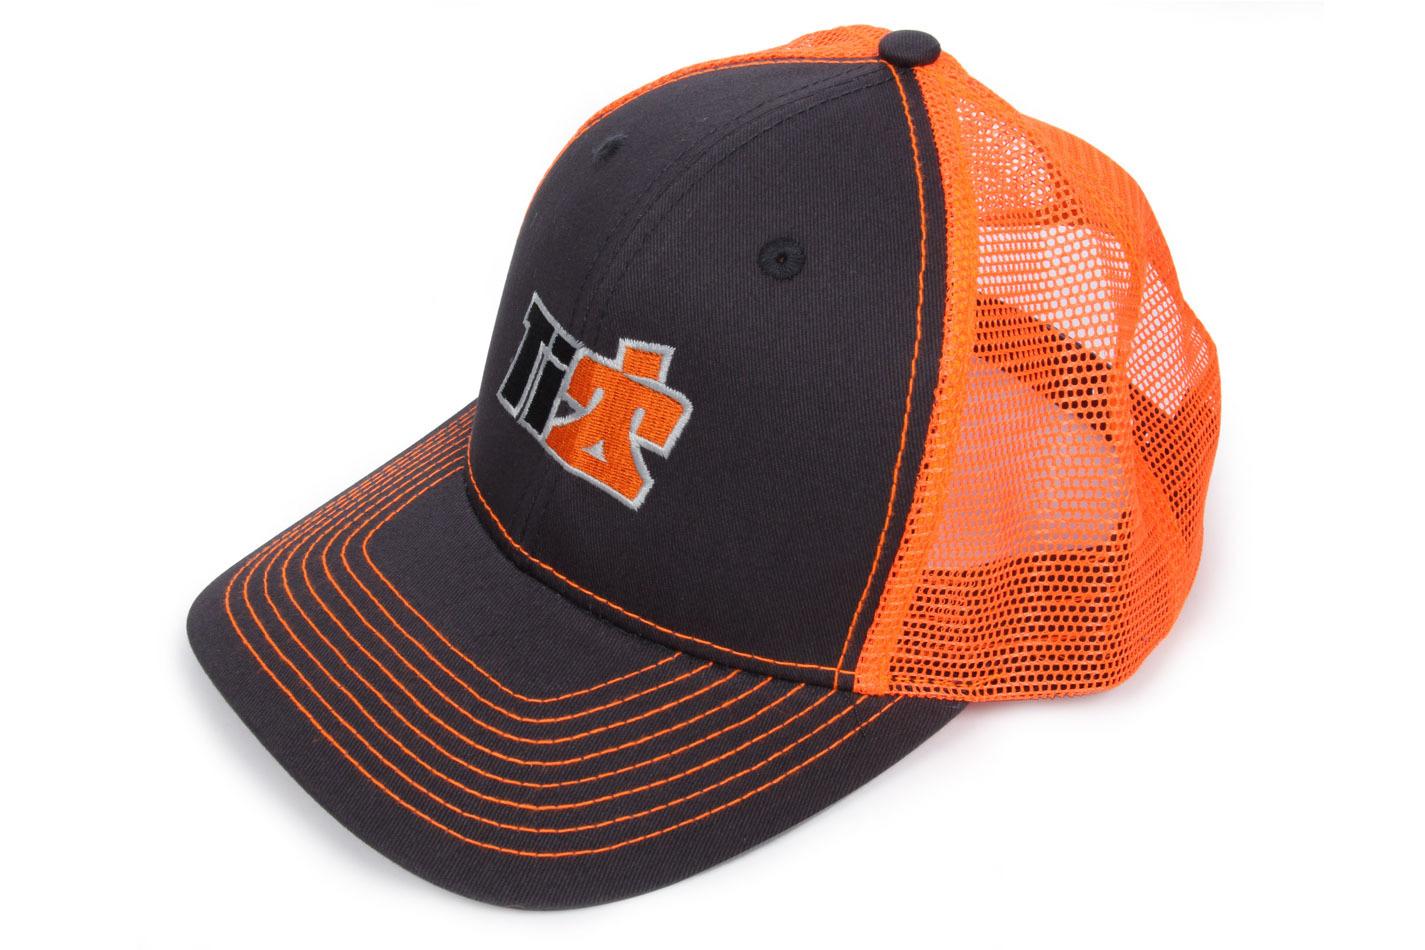 Ti22 Performance Ti22 Mesh Trucker Hat Gray/Orange